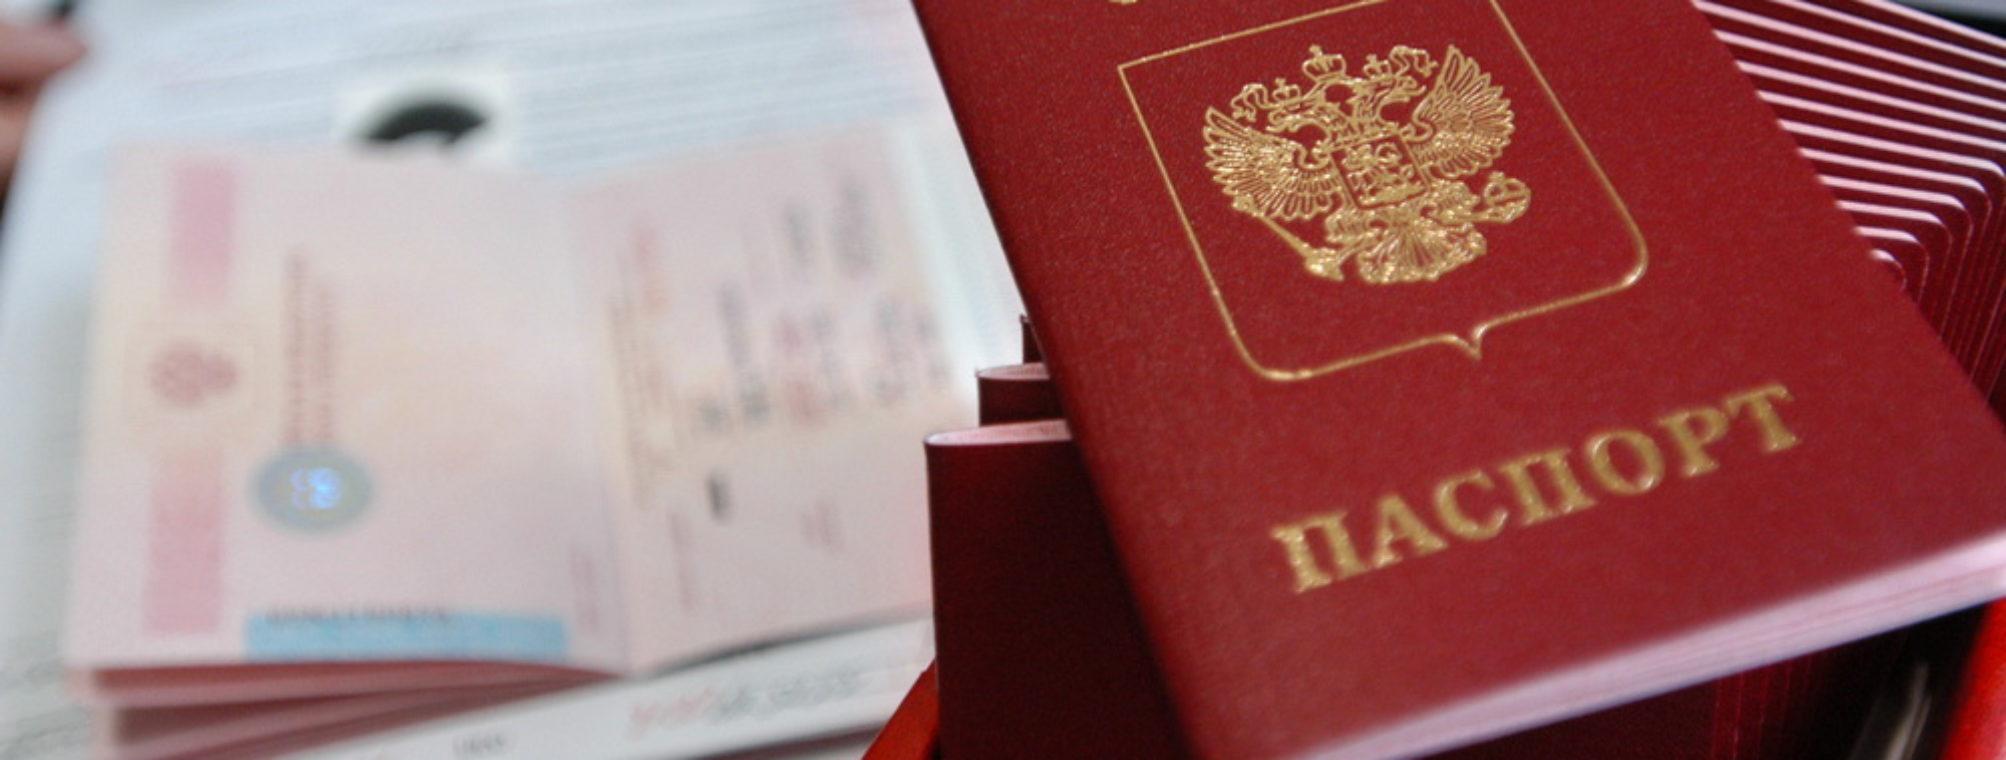 Какие документы необходимы для загранпаспорта через мфц